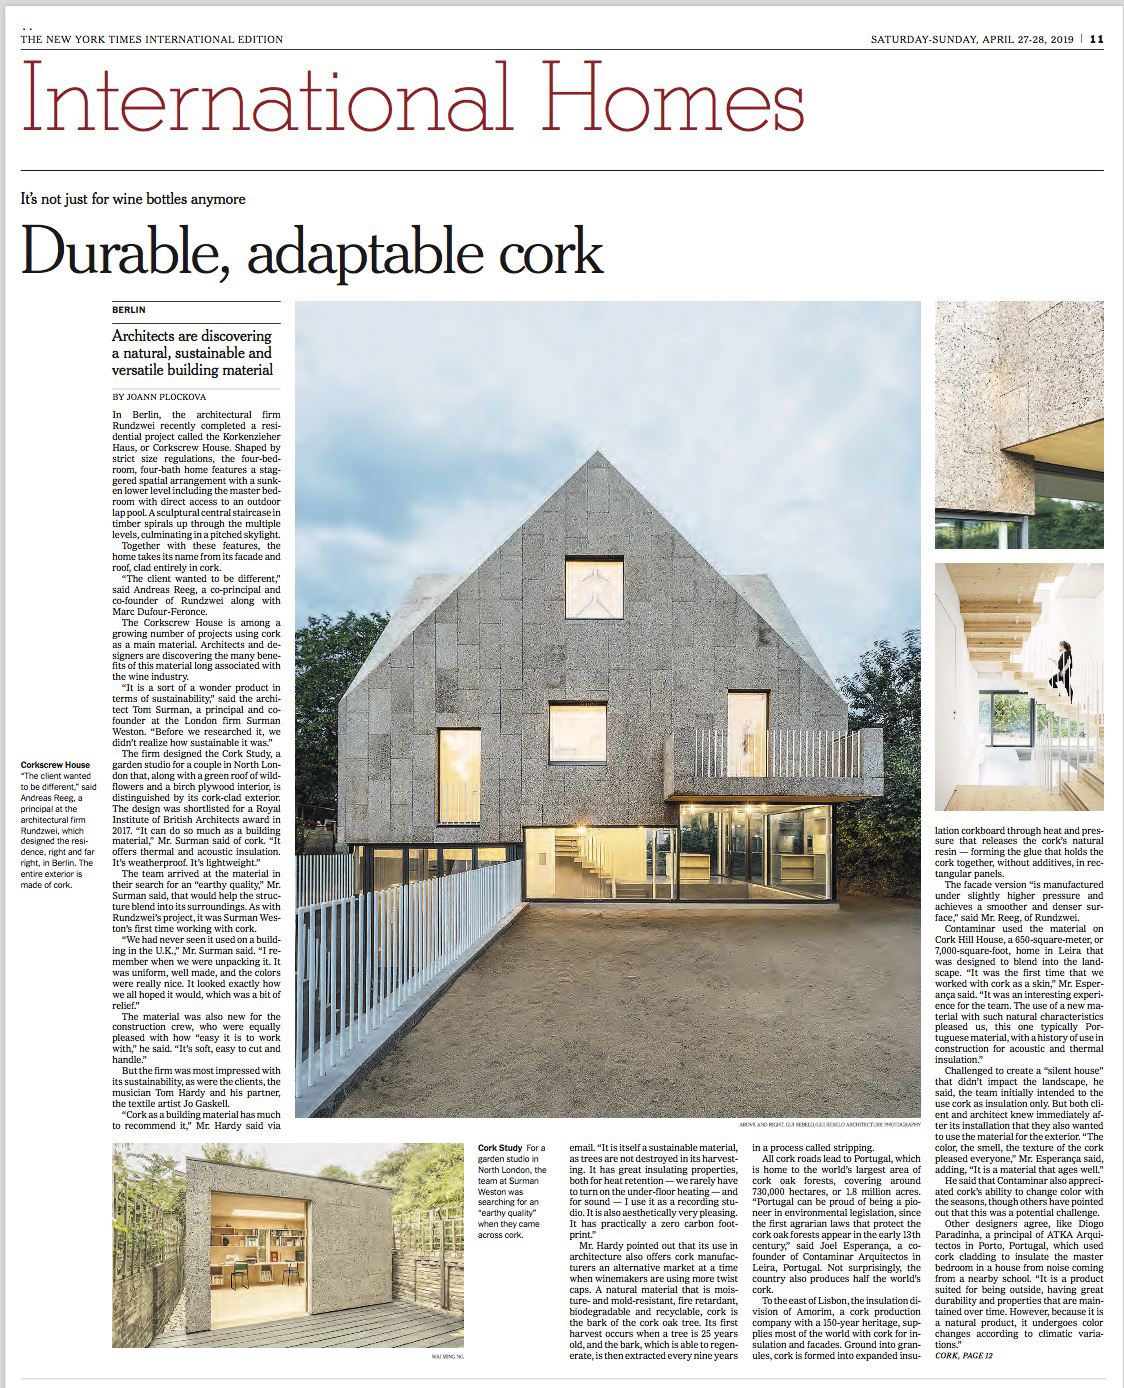 New York Times, Korkenzieher Haus_01.jpg